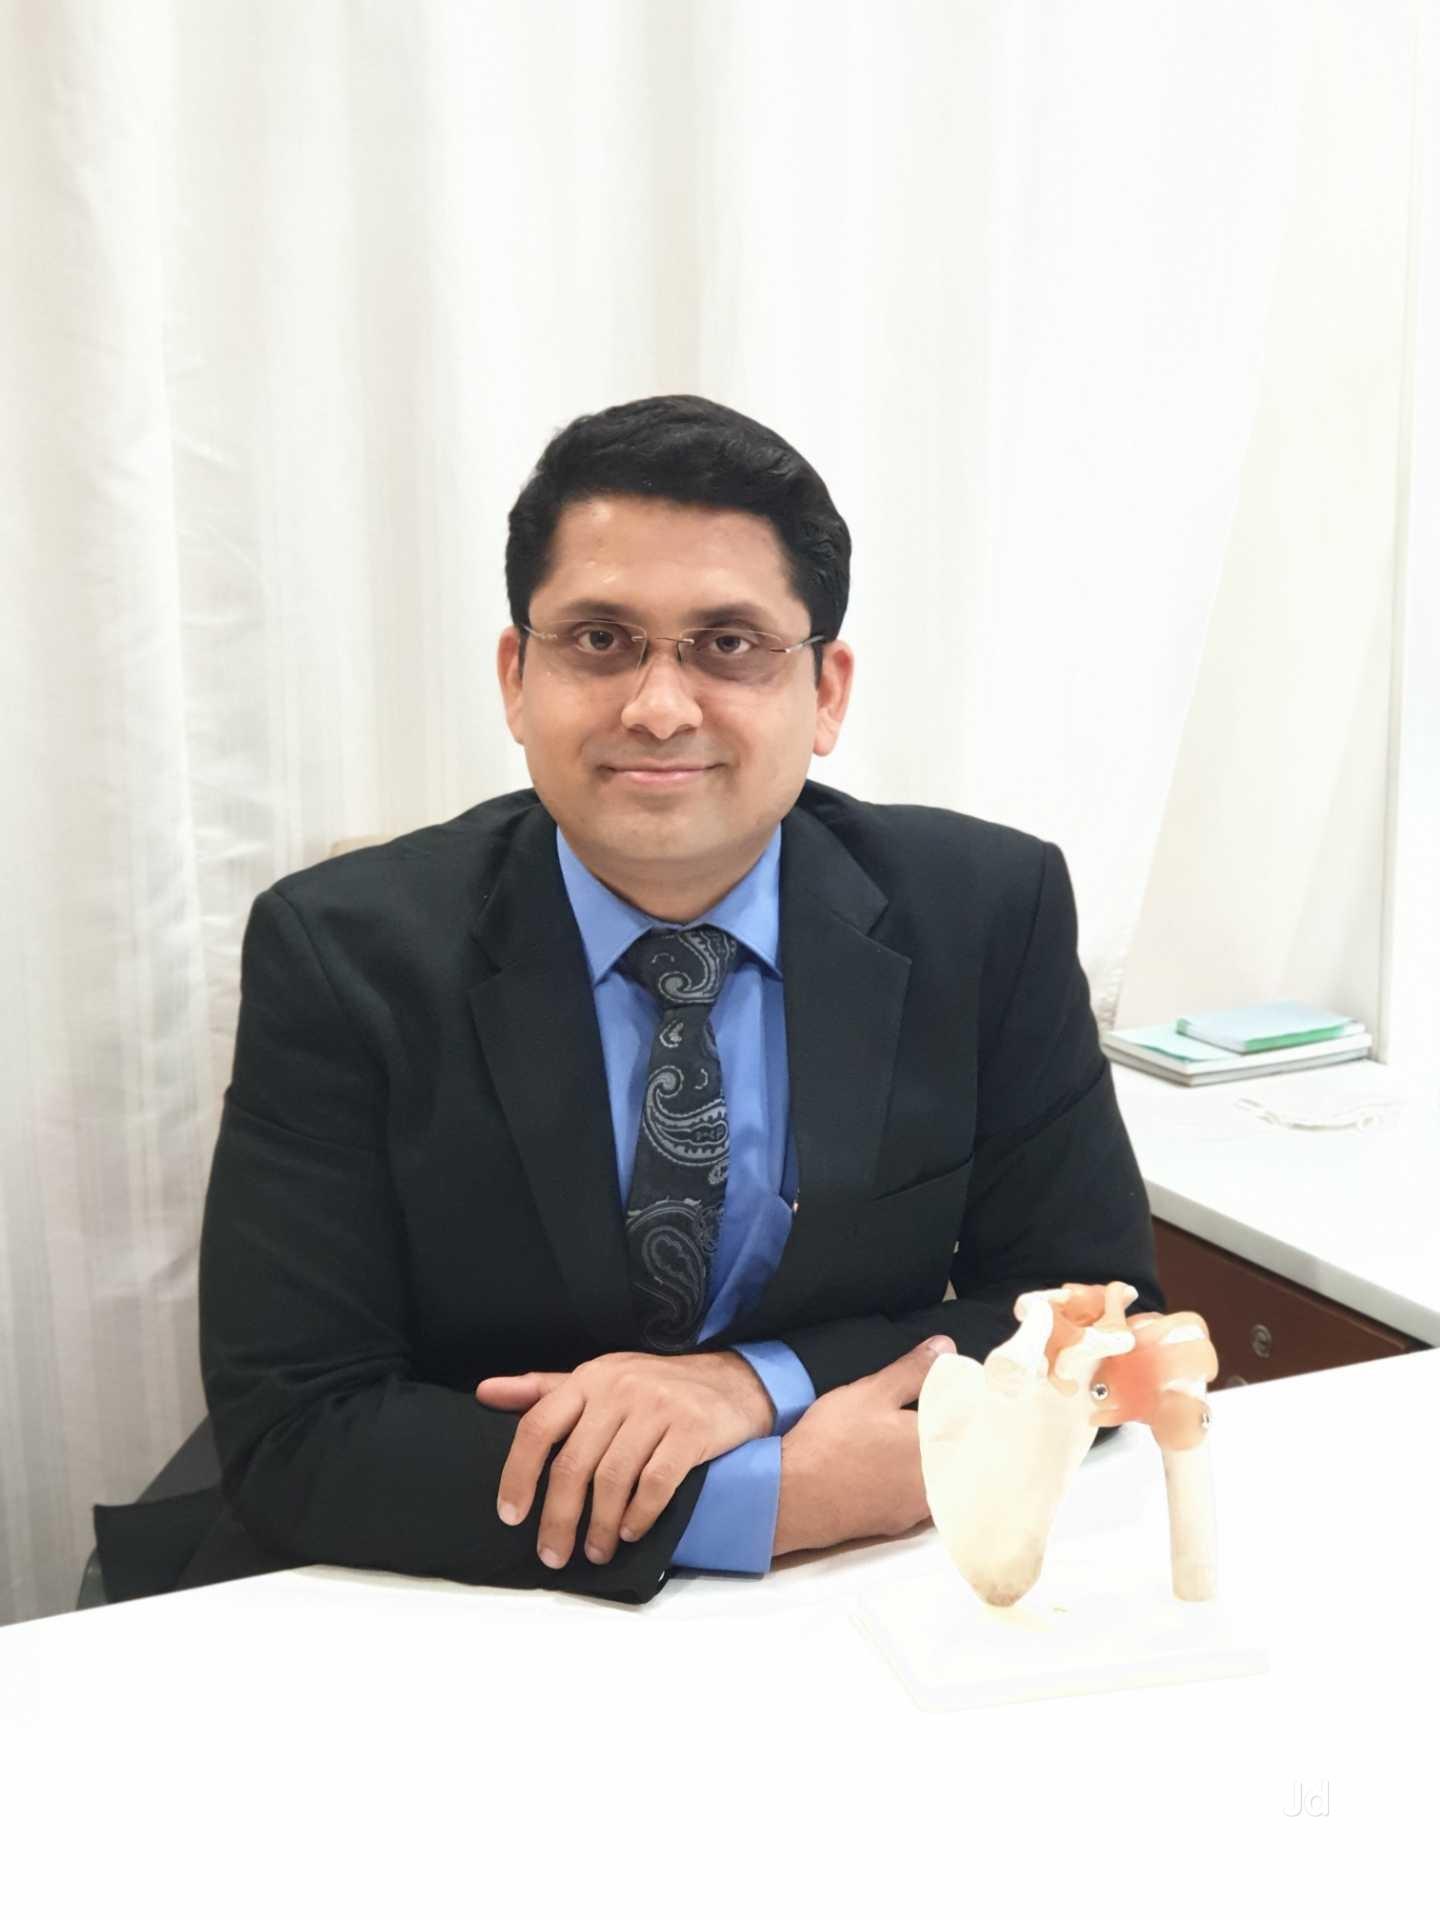 Best Orthopedic and Knee Replacement Doctor in Surat Gujarat | Wellknown Orthopedic Hospital in Surat